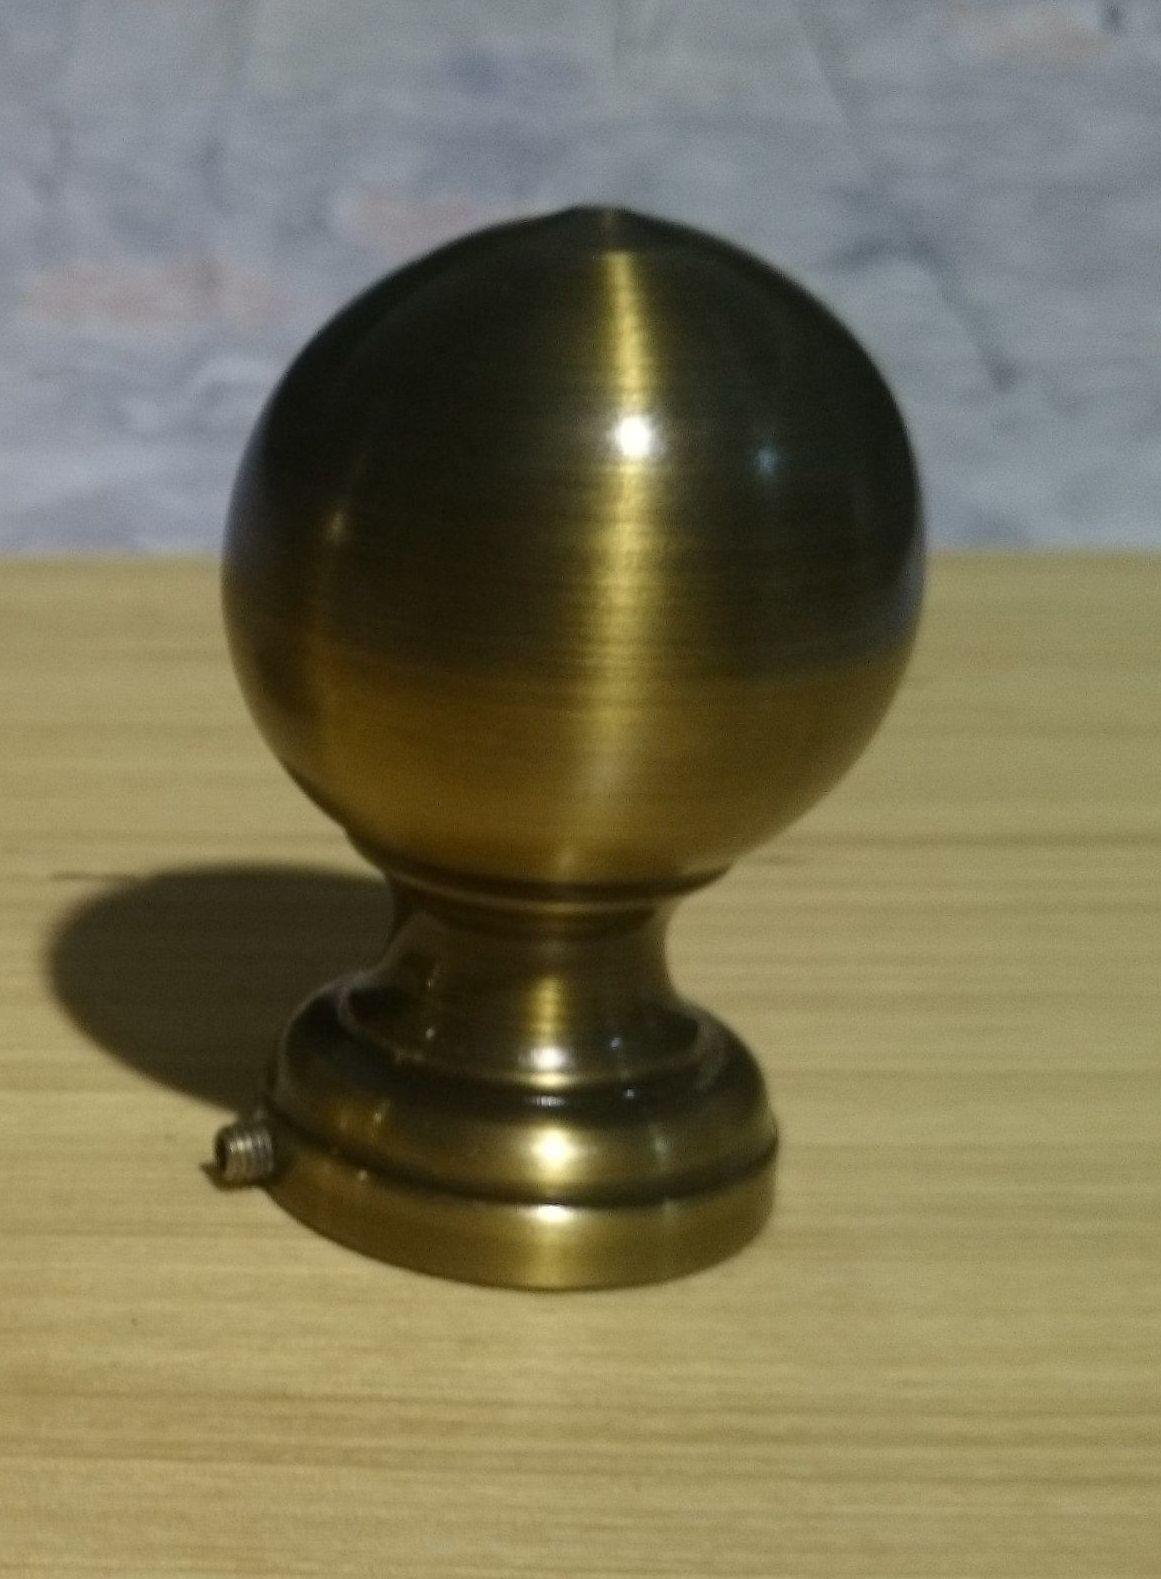 Bola lacada en bronce envejecido: Catálogo de muebles de forja de Forja Manuel Jiménez